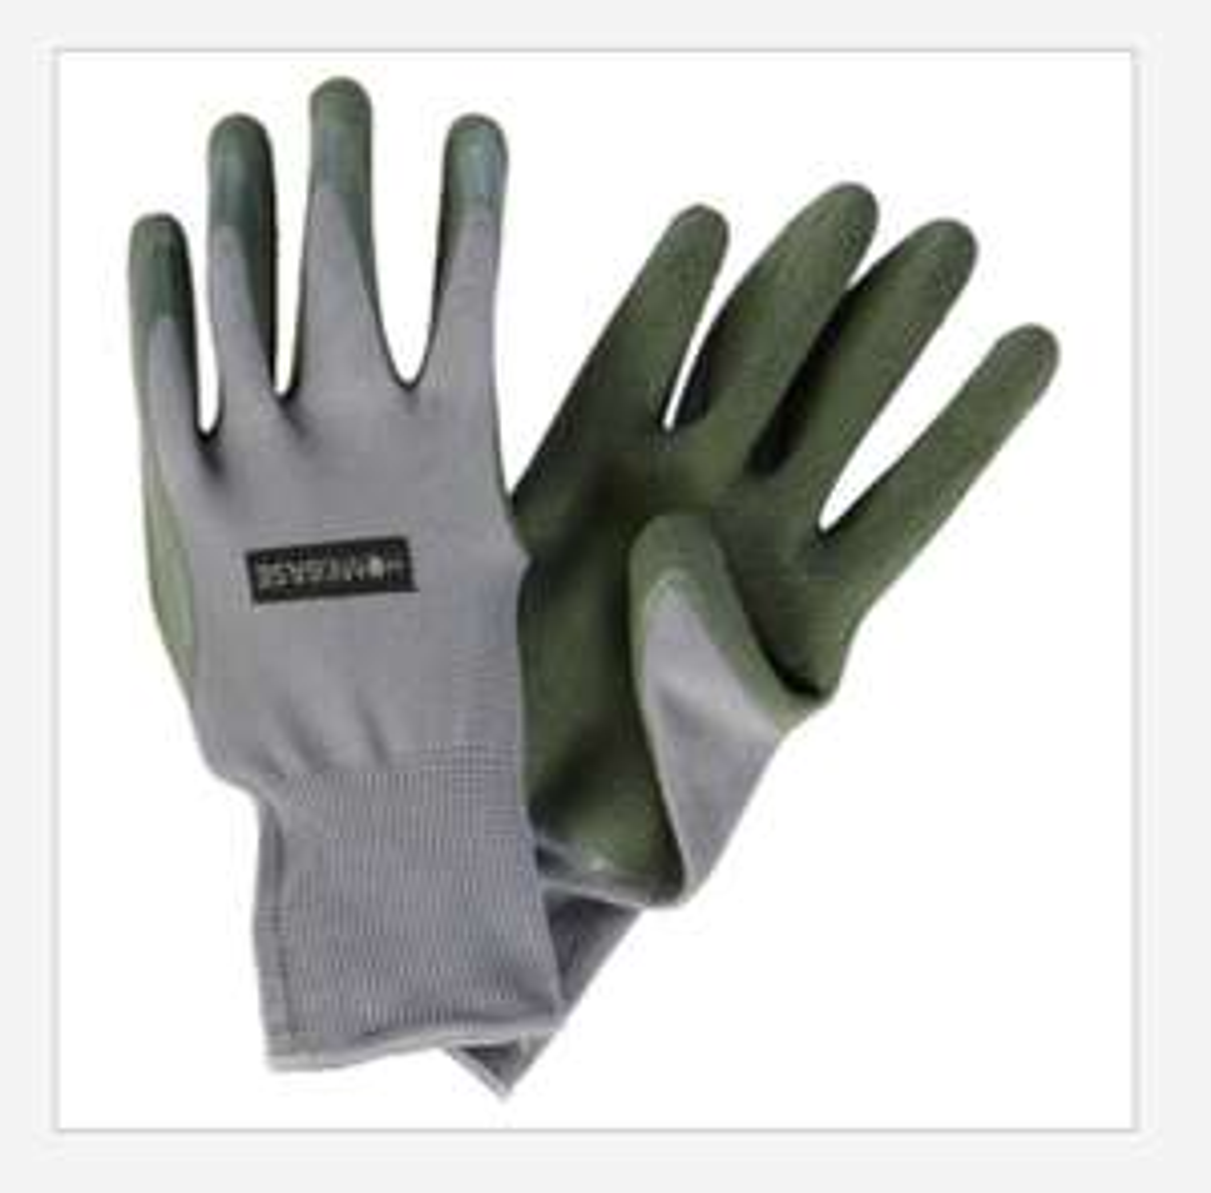 Homebase Gardening Gloves Medium/Large 3 pack/3 Variations per pack £2.50 @ Homebase - Store pickup: Free